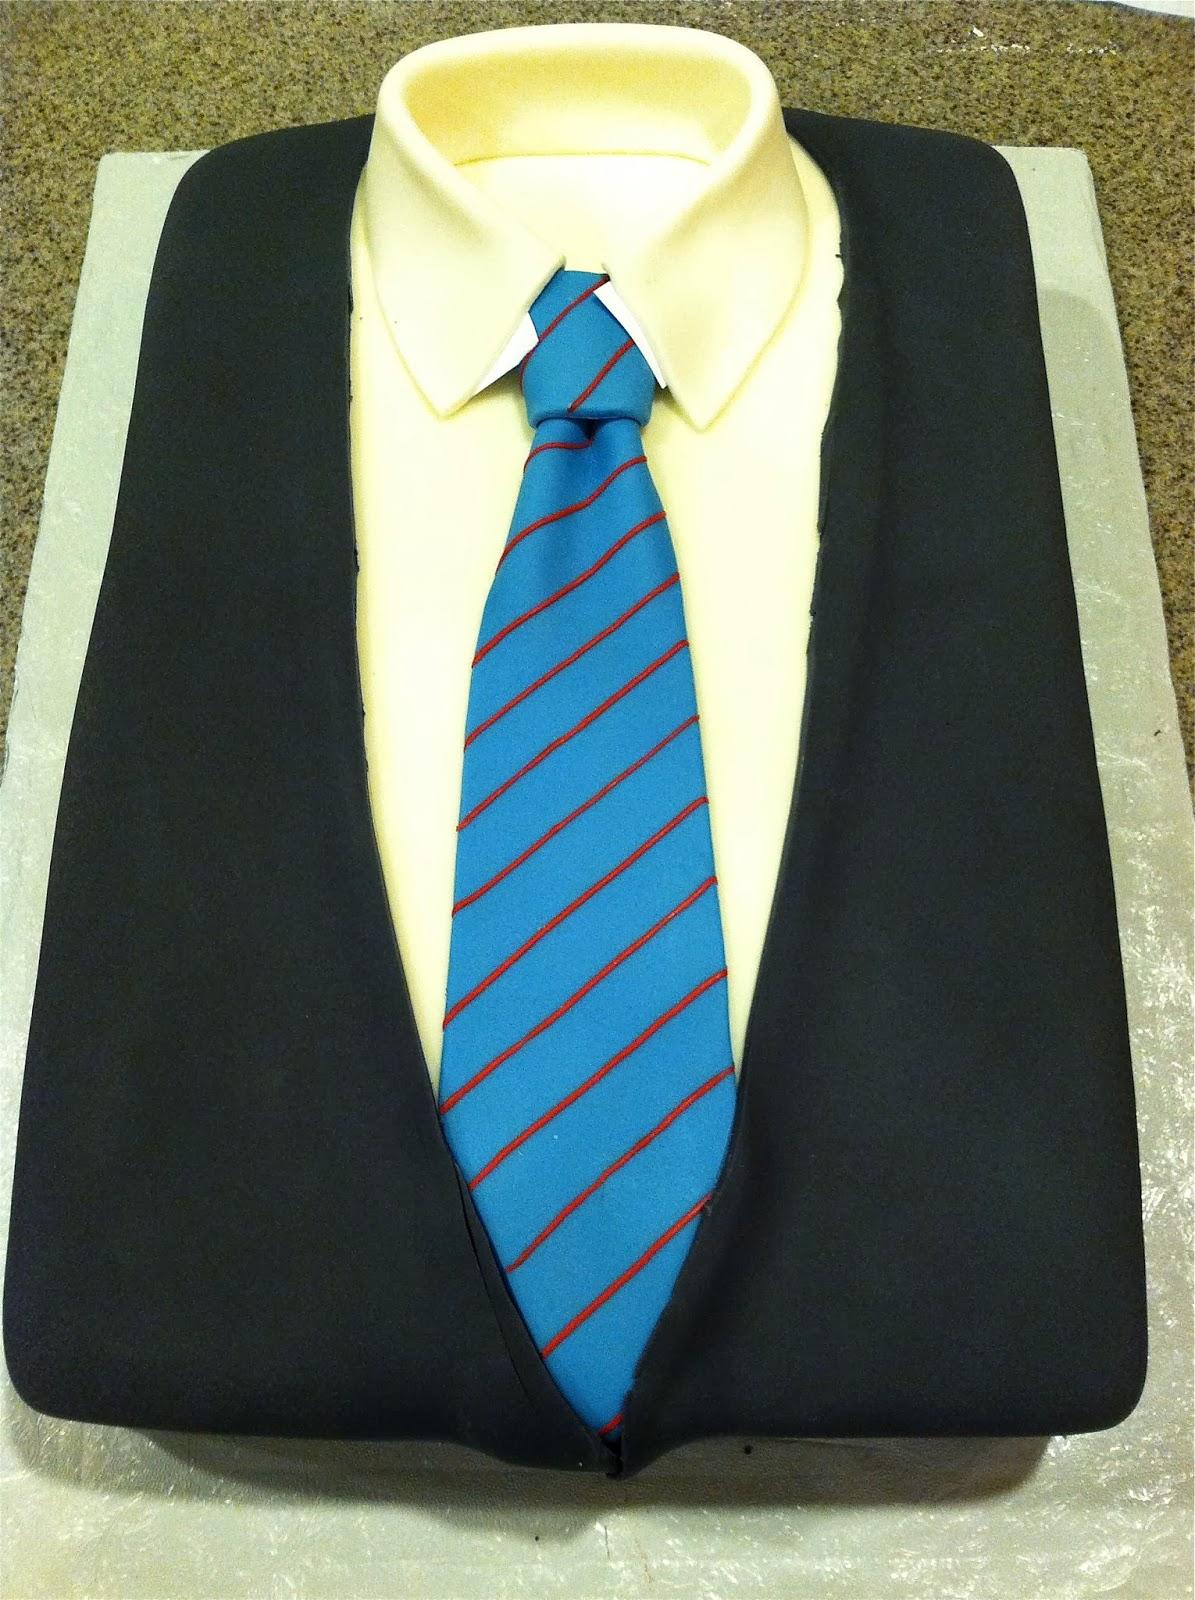 Sara Elizabeth Custom Cakes Gourmet Sweets Suit And